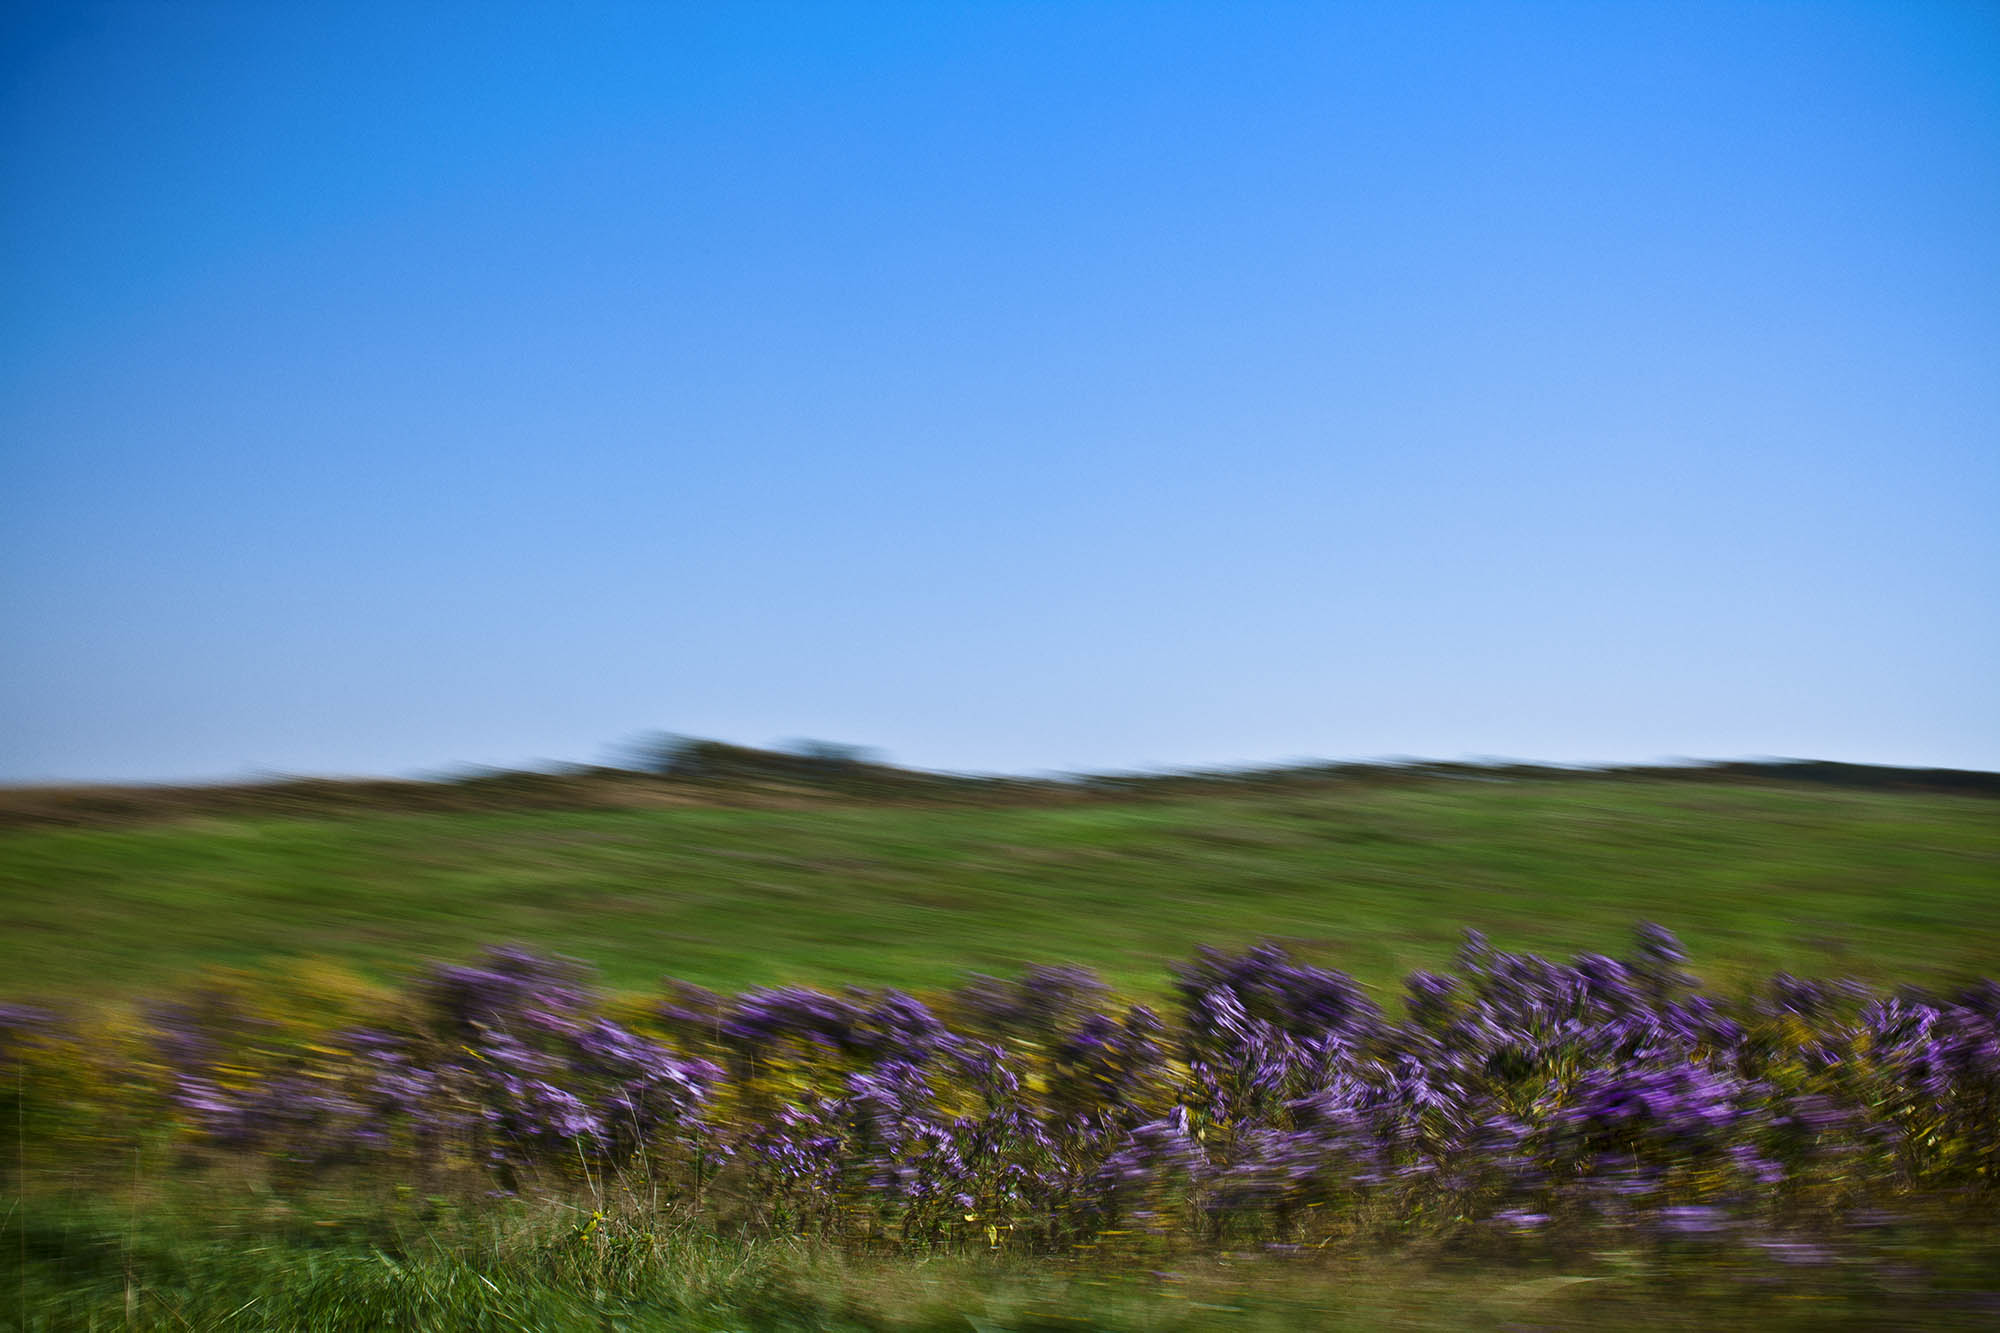 purple loostrife-0443.jpg